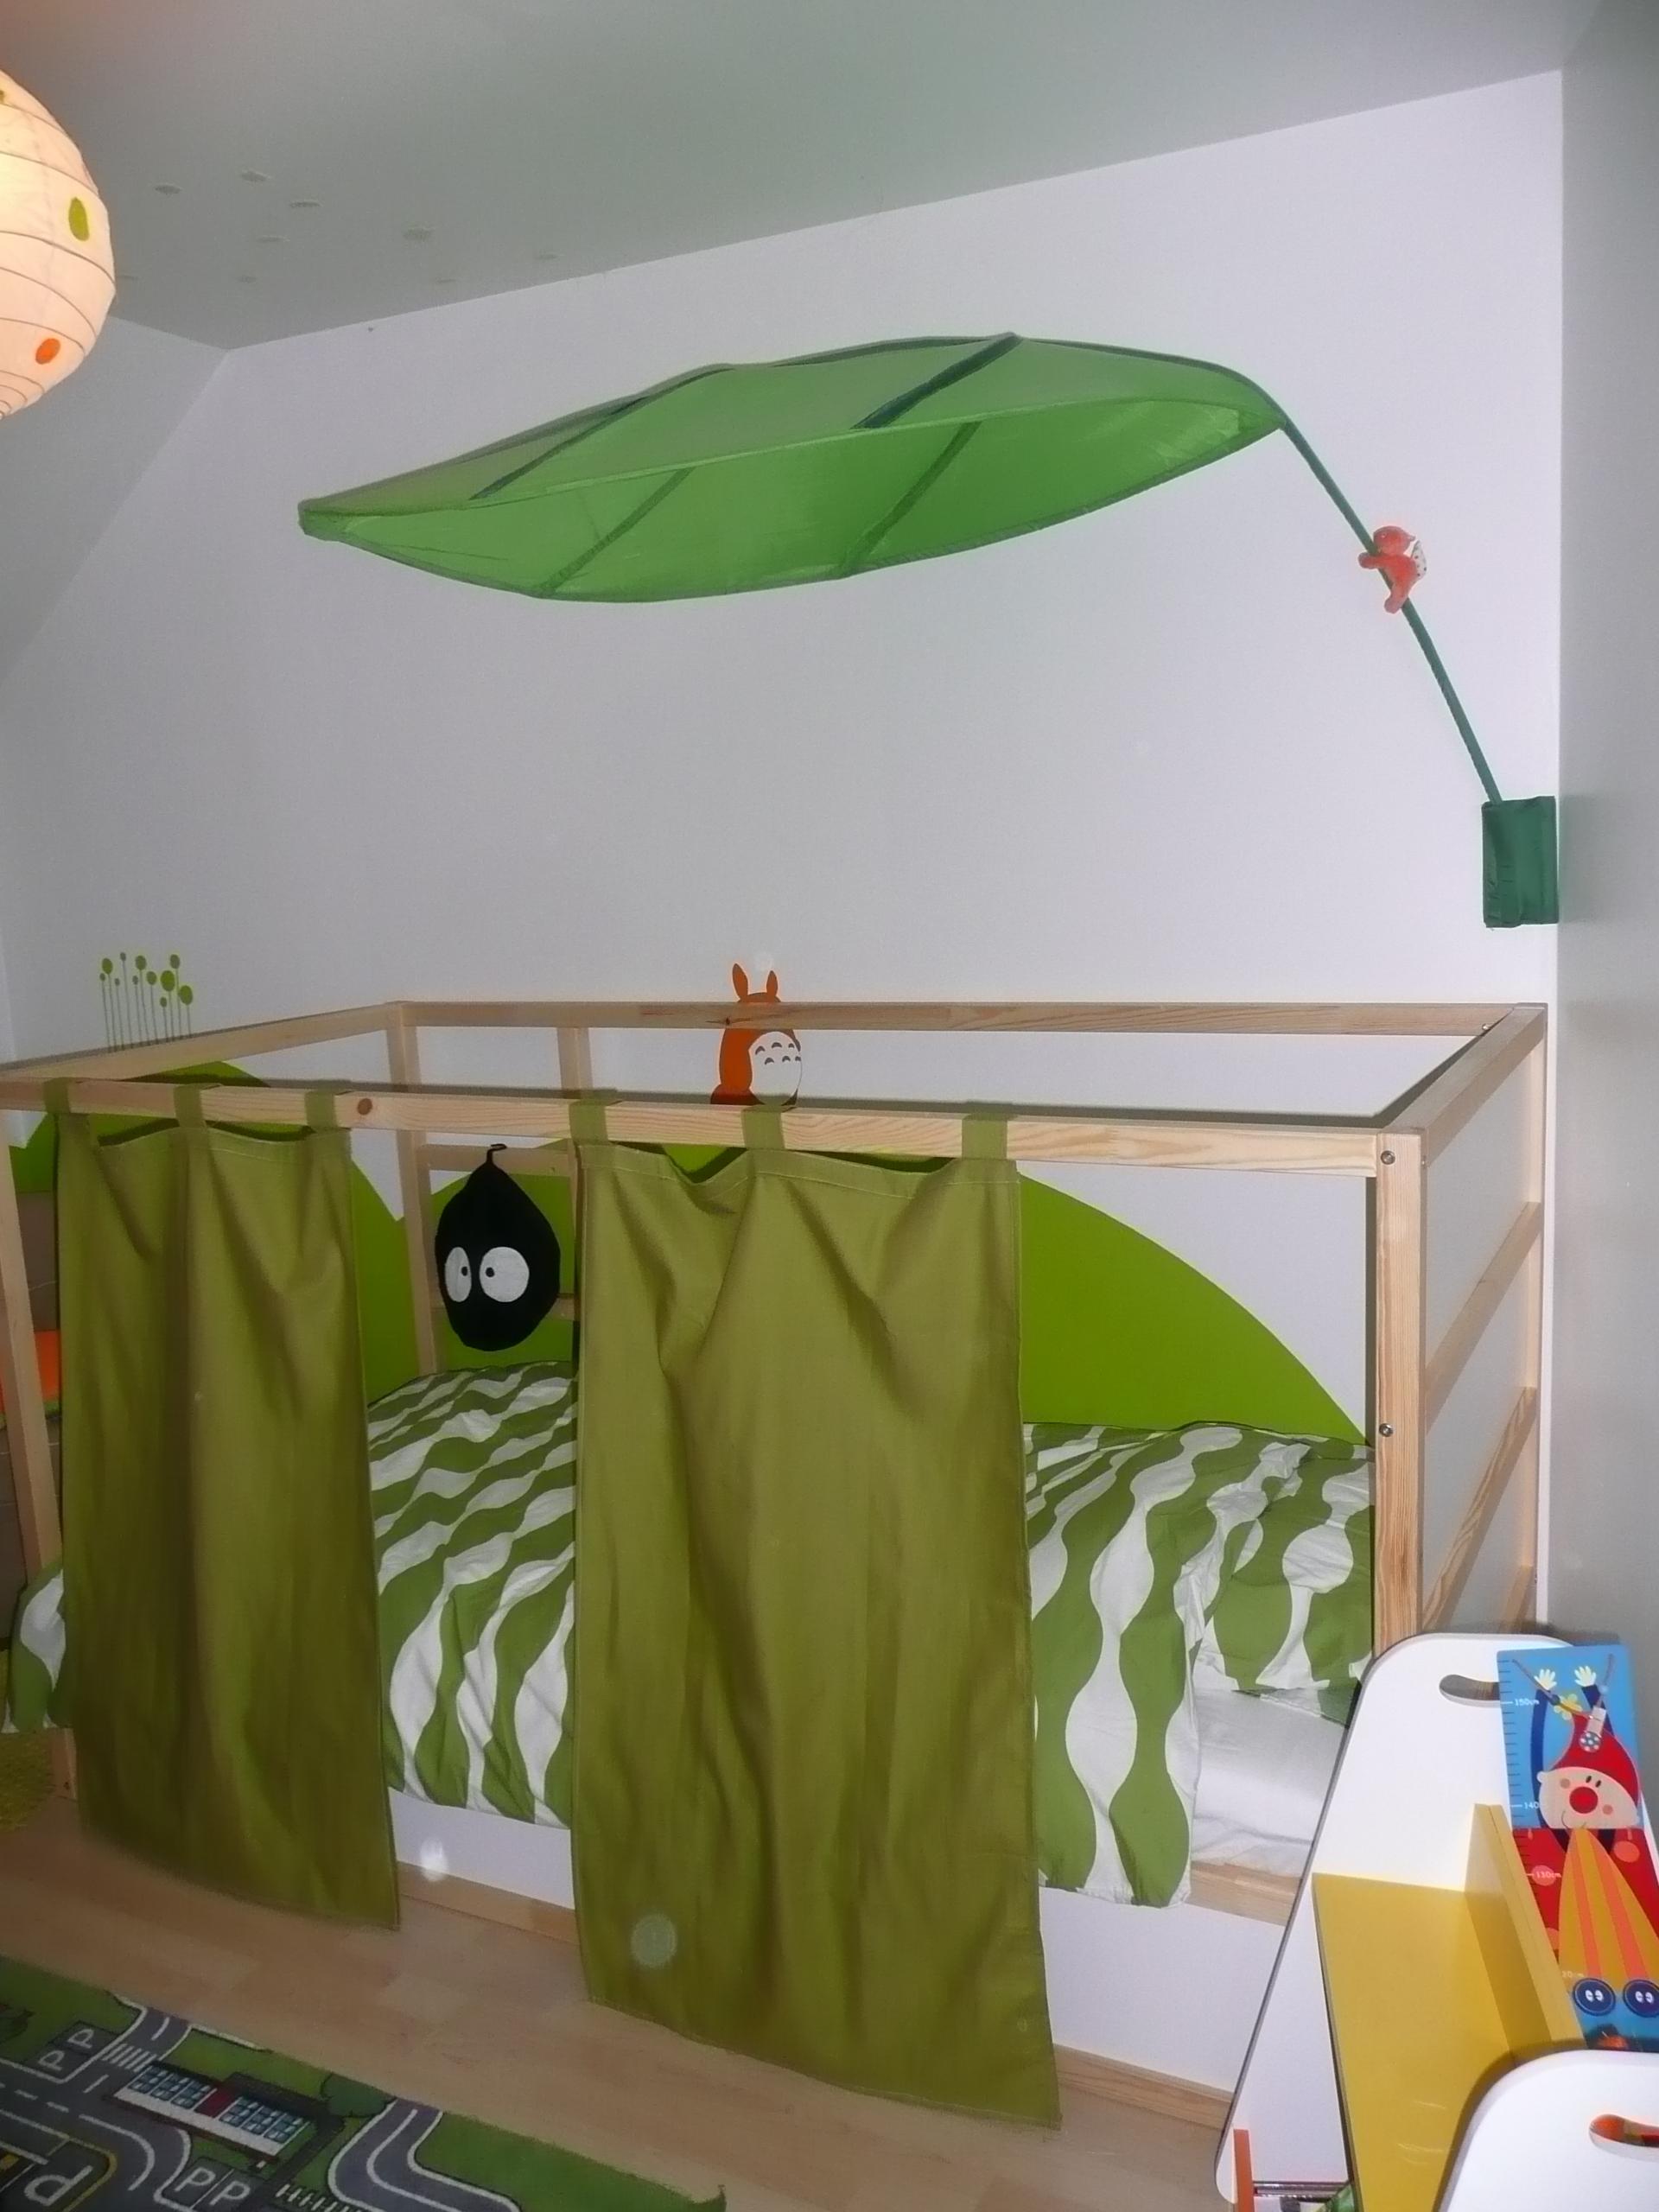 lit kura cabane amazing lit cabane places lit cabane. Black Bedroom Furniture Sets. Home Design Ideas